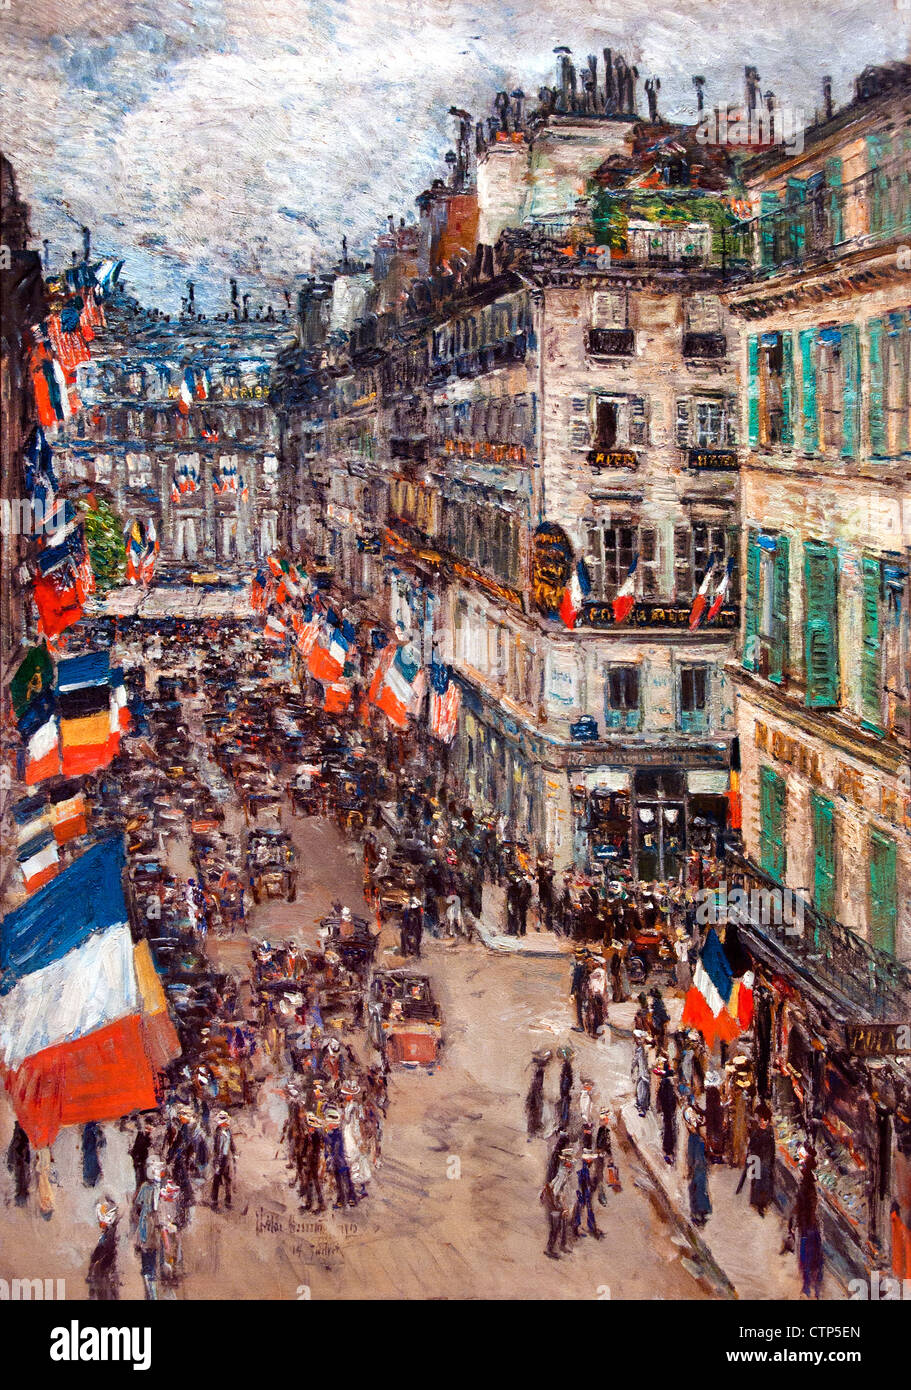 14 July Fourteenth 14 Rue Daunou ( Paris France ) 1910 Childe Hassam American United States of America - Stock Image